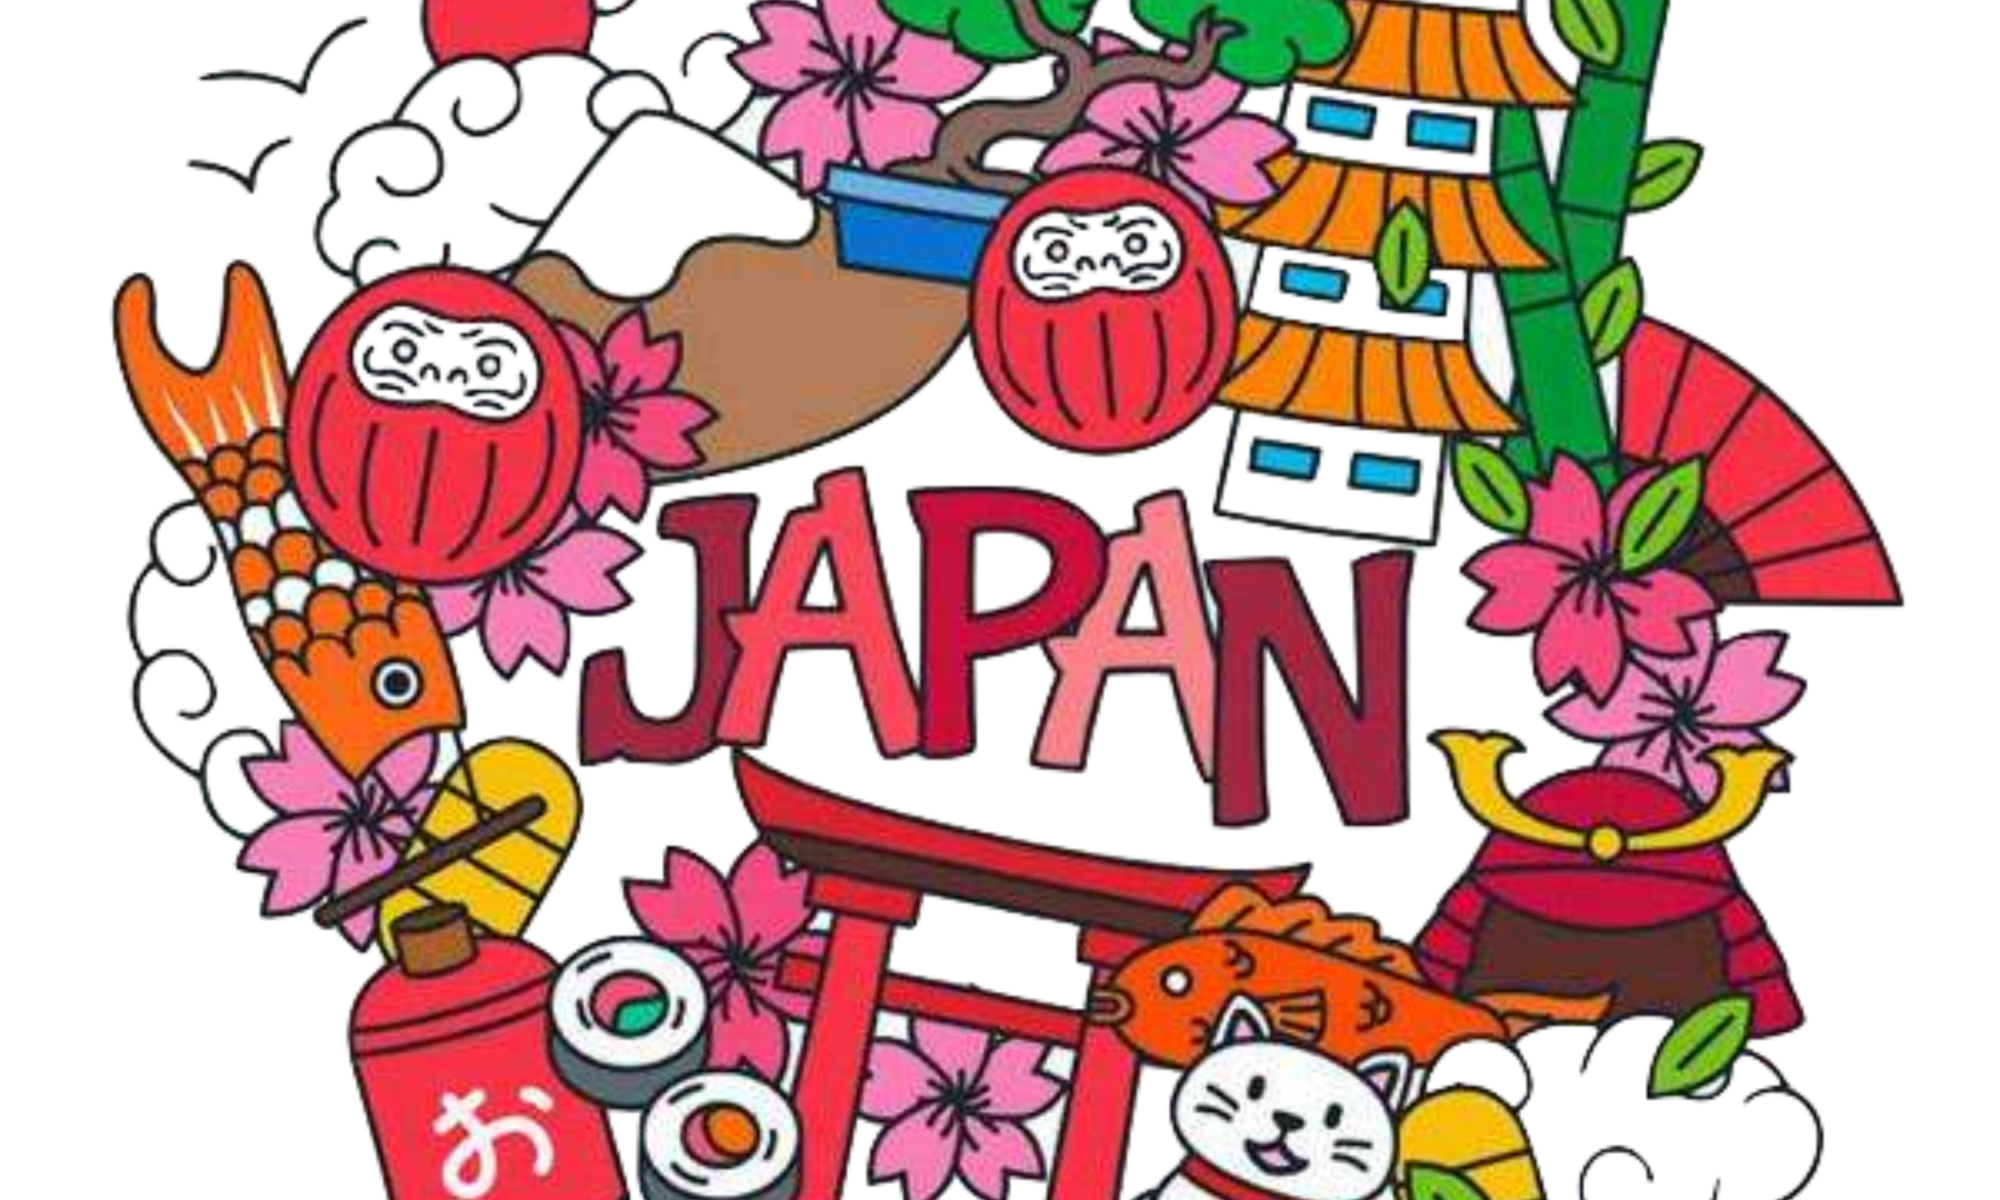 ichibansake.com